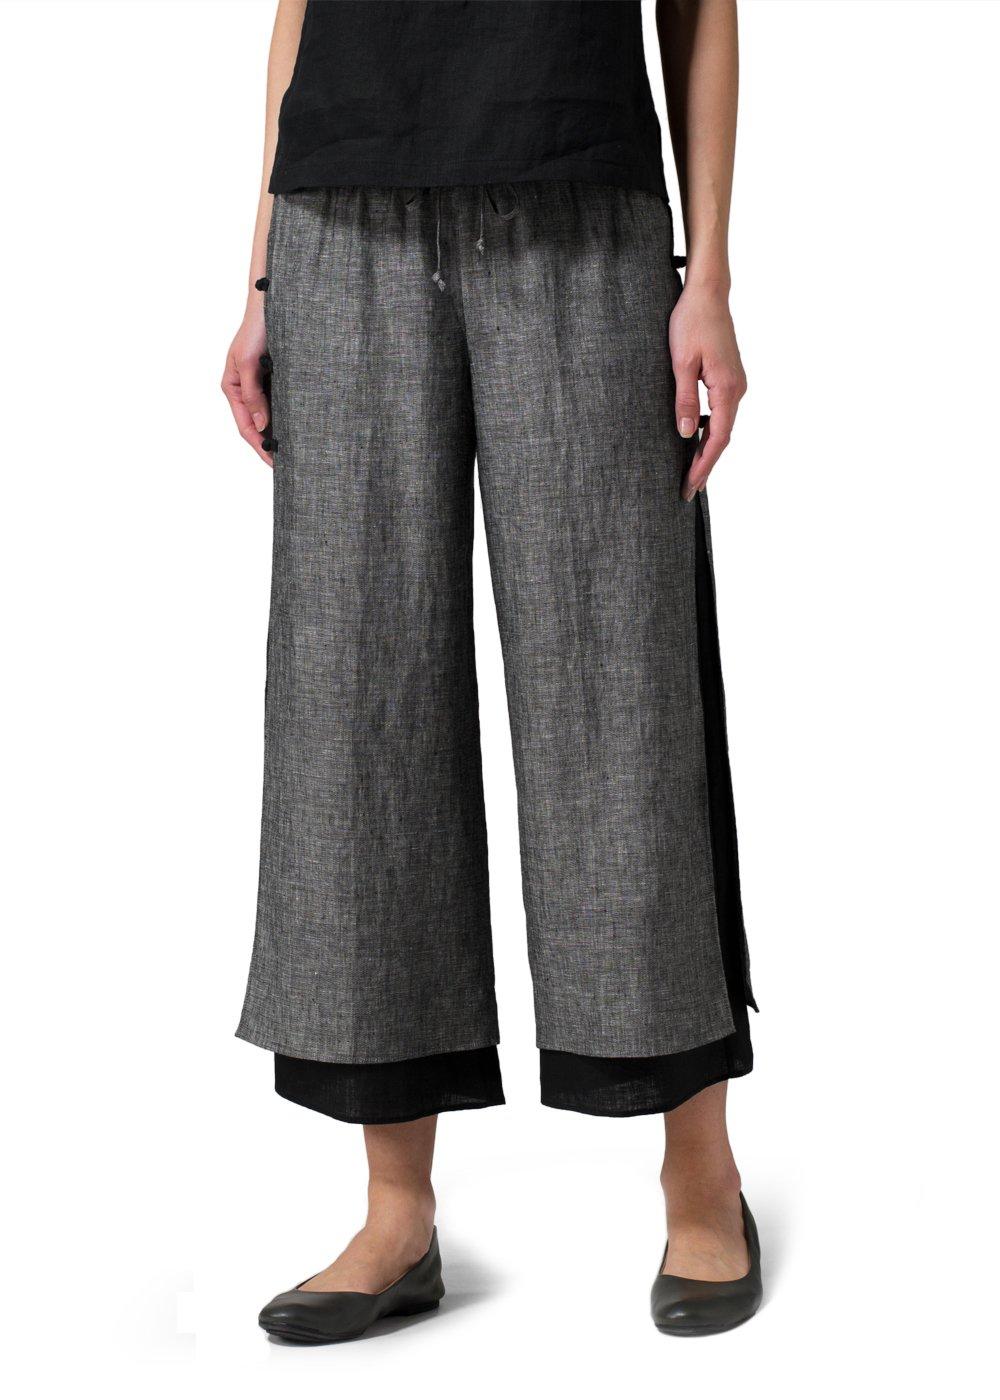 Vivid Linen Double-Layer Cropped Pants-2X-Two Tone Black/Black